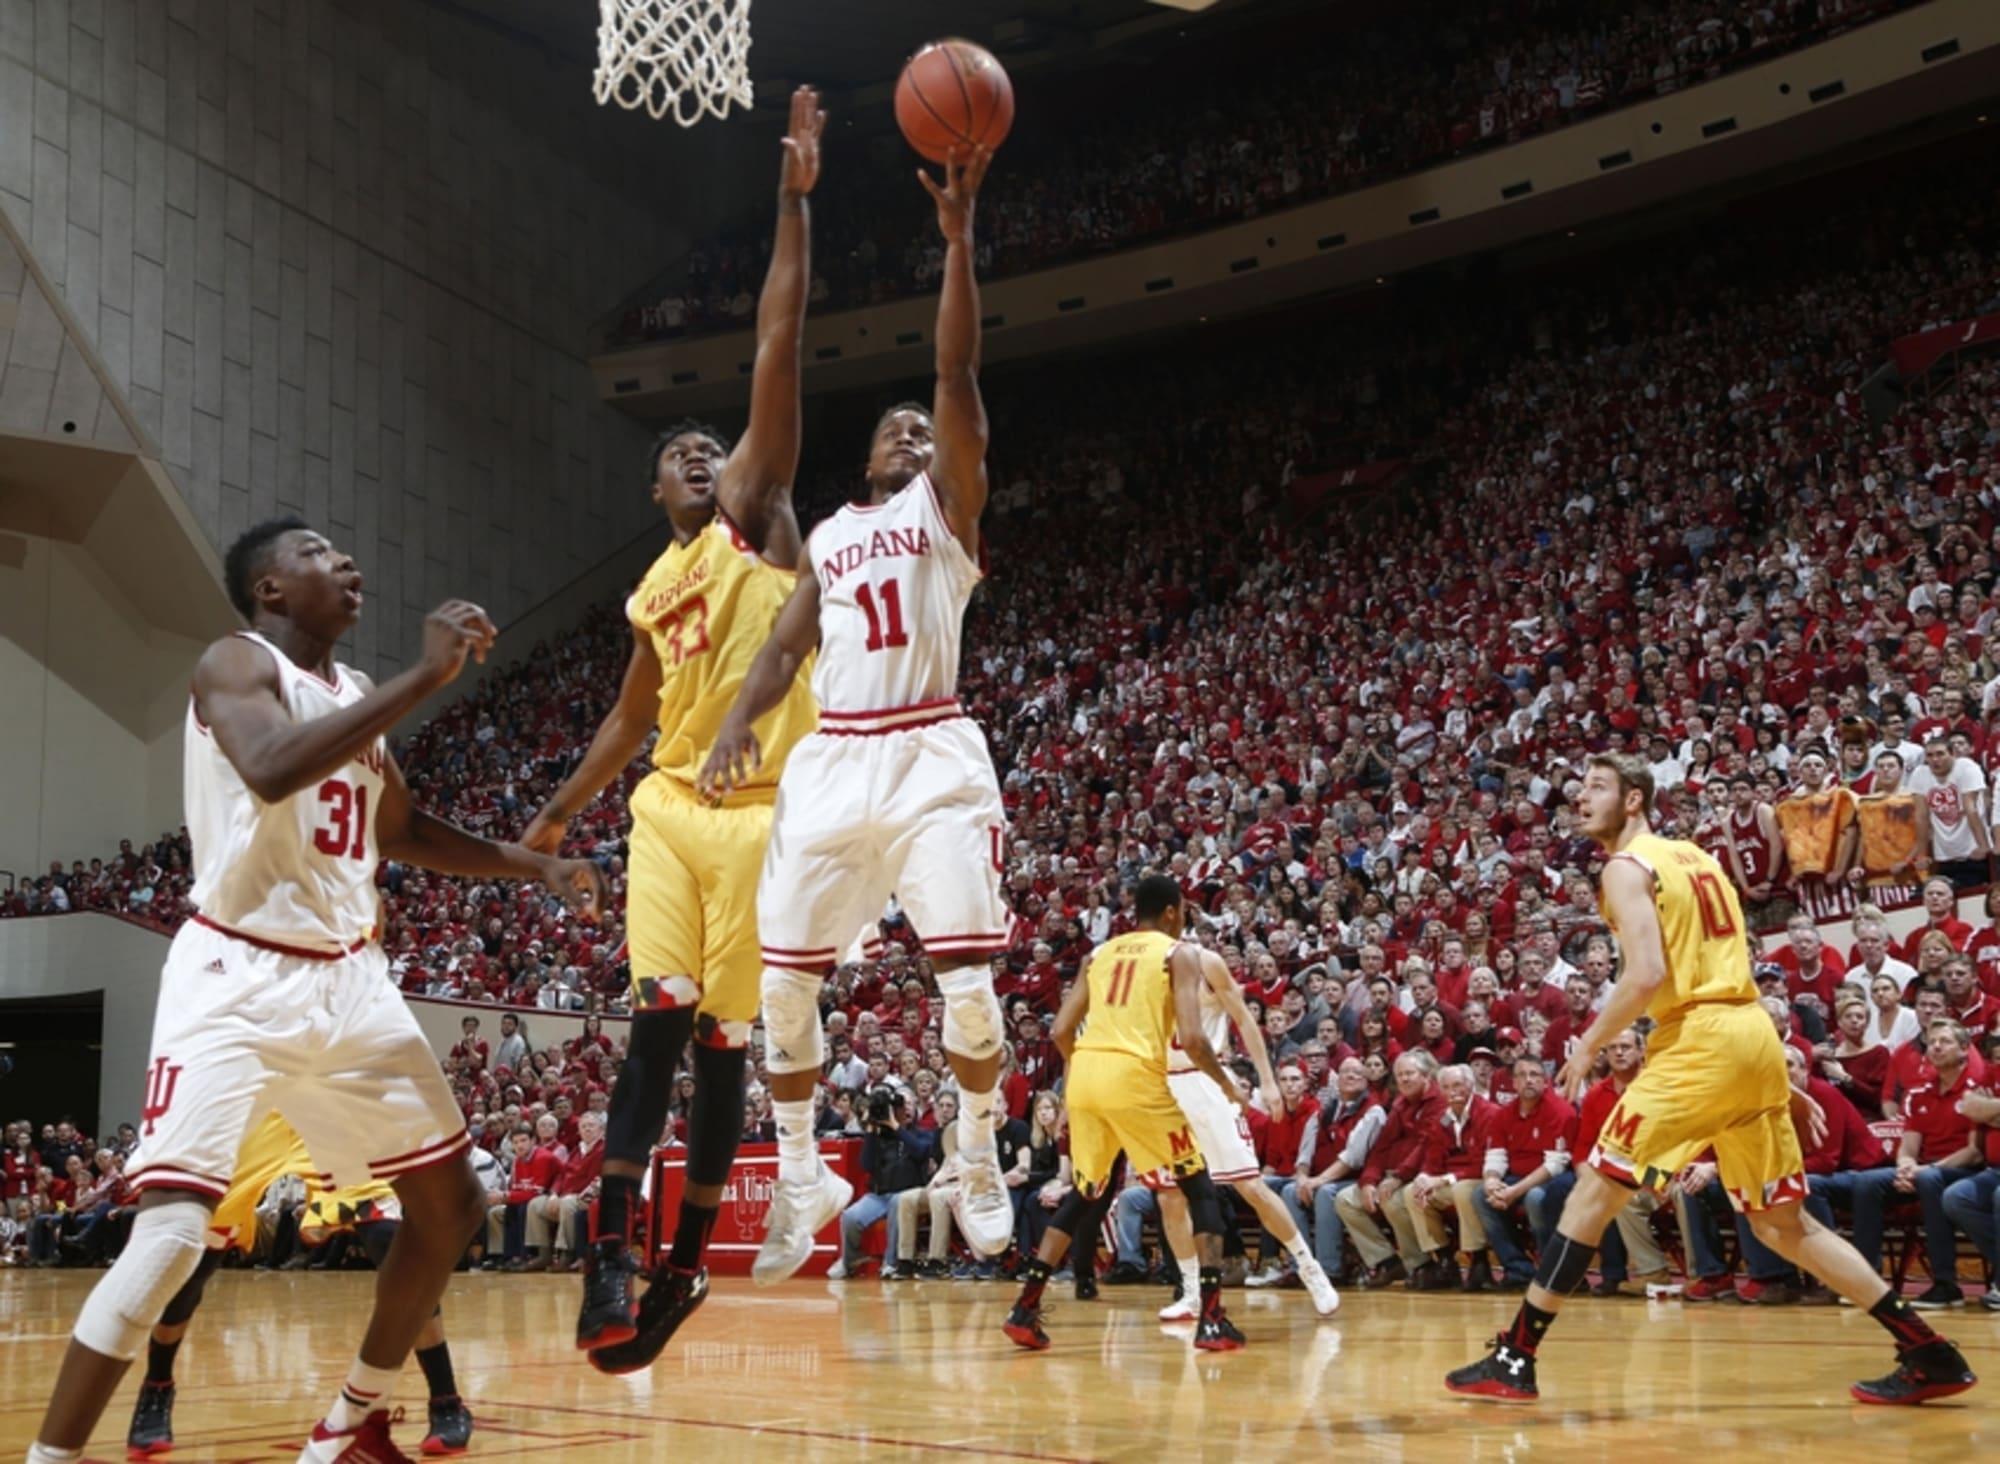 Maryland Basketball: Terps fall to Indiana